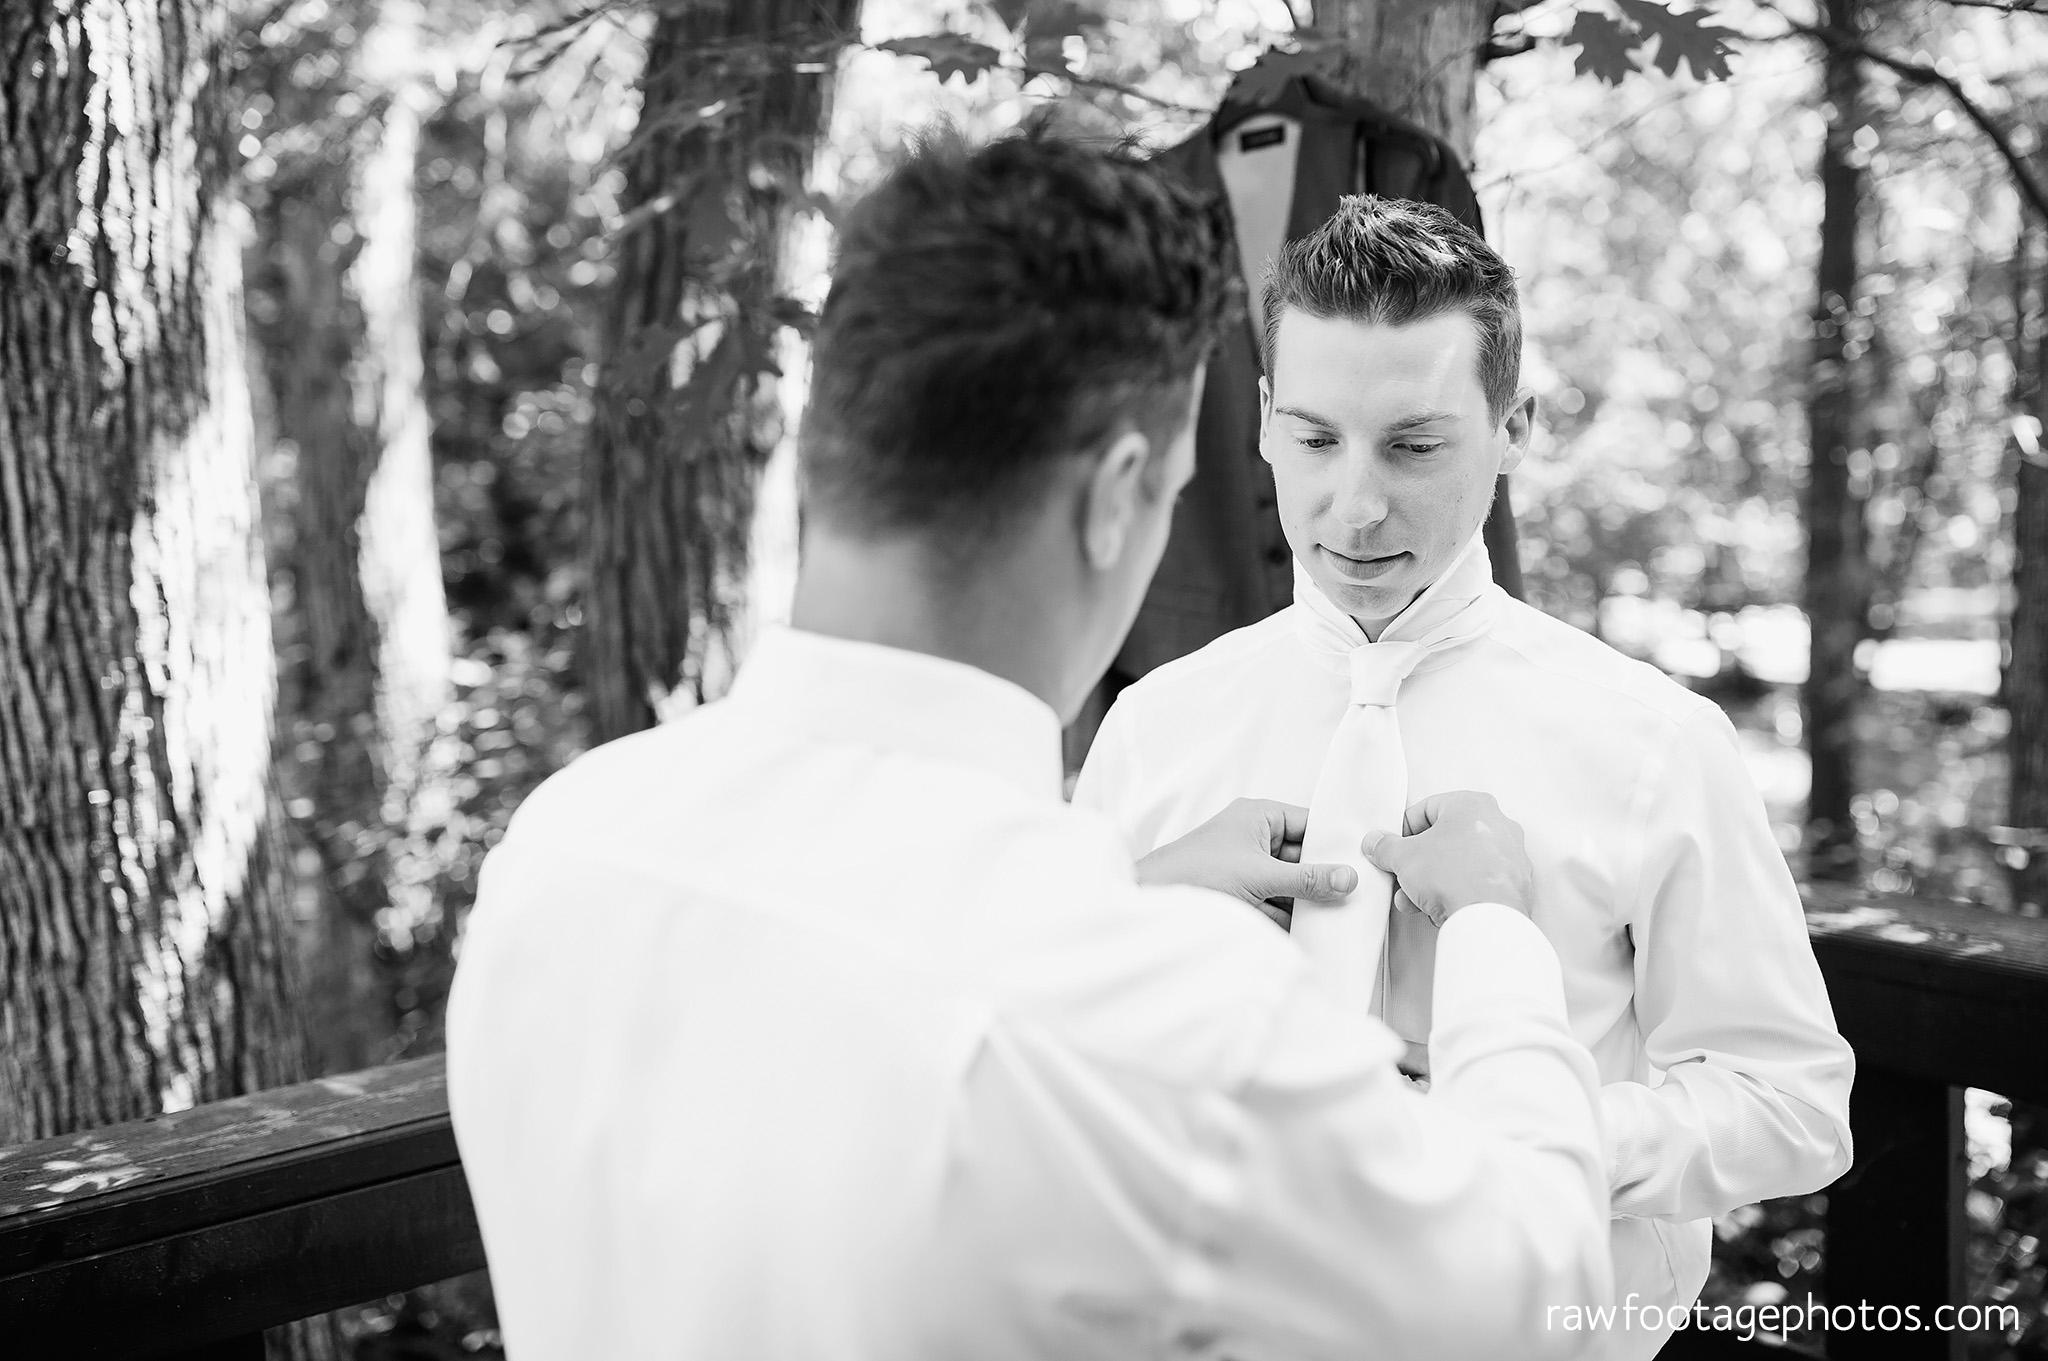 london_ontario_wedding_photographer-grand_bend_wedding_photographer-oakwood_resort_wedding-beach_wedding-sunset_wedding-raw_footage_photography005.jpg